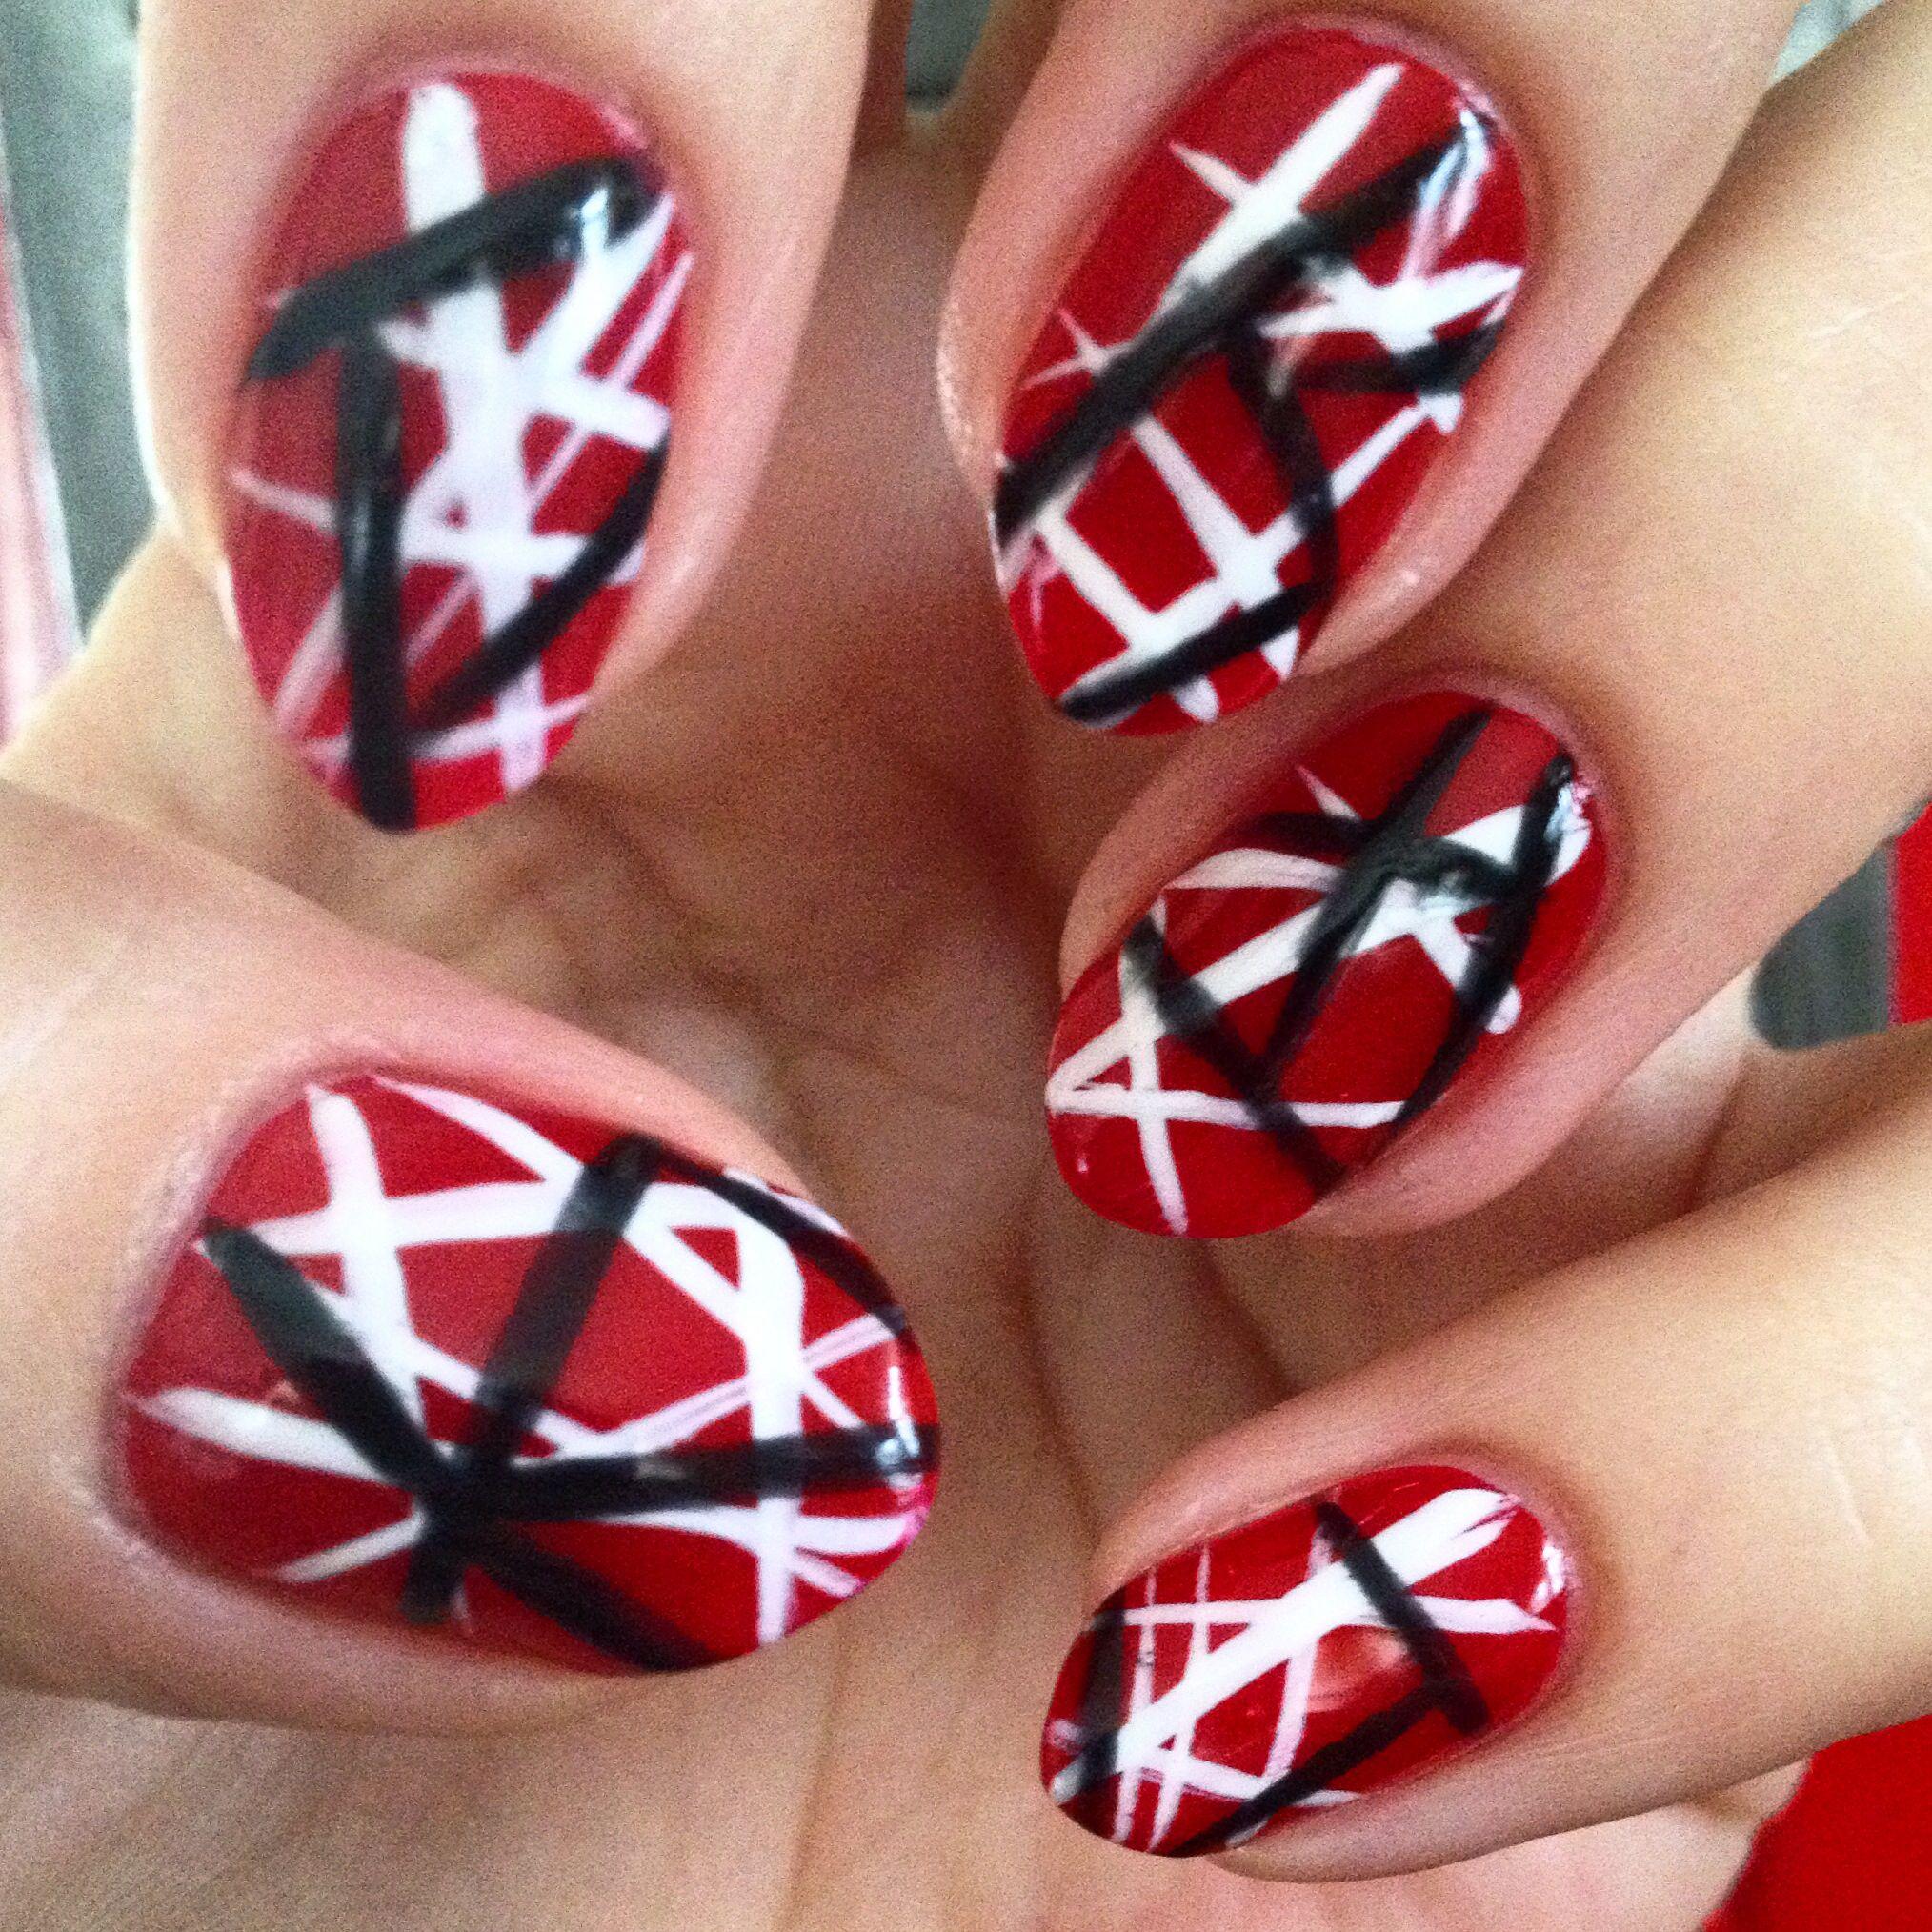 Inspired By Edward Van Halen S Kramer 5150 Guitar Opi In Big Apple Red Essie In Blanc And Licorice Essiepolish Nail Designs Nail Art Essie Polish